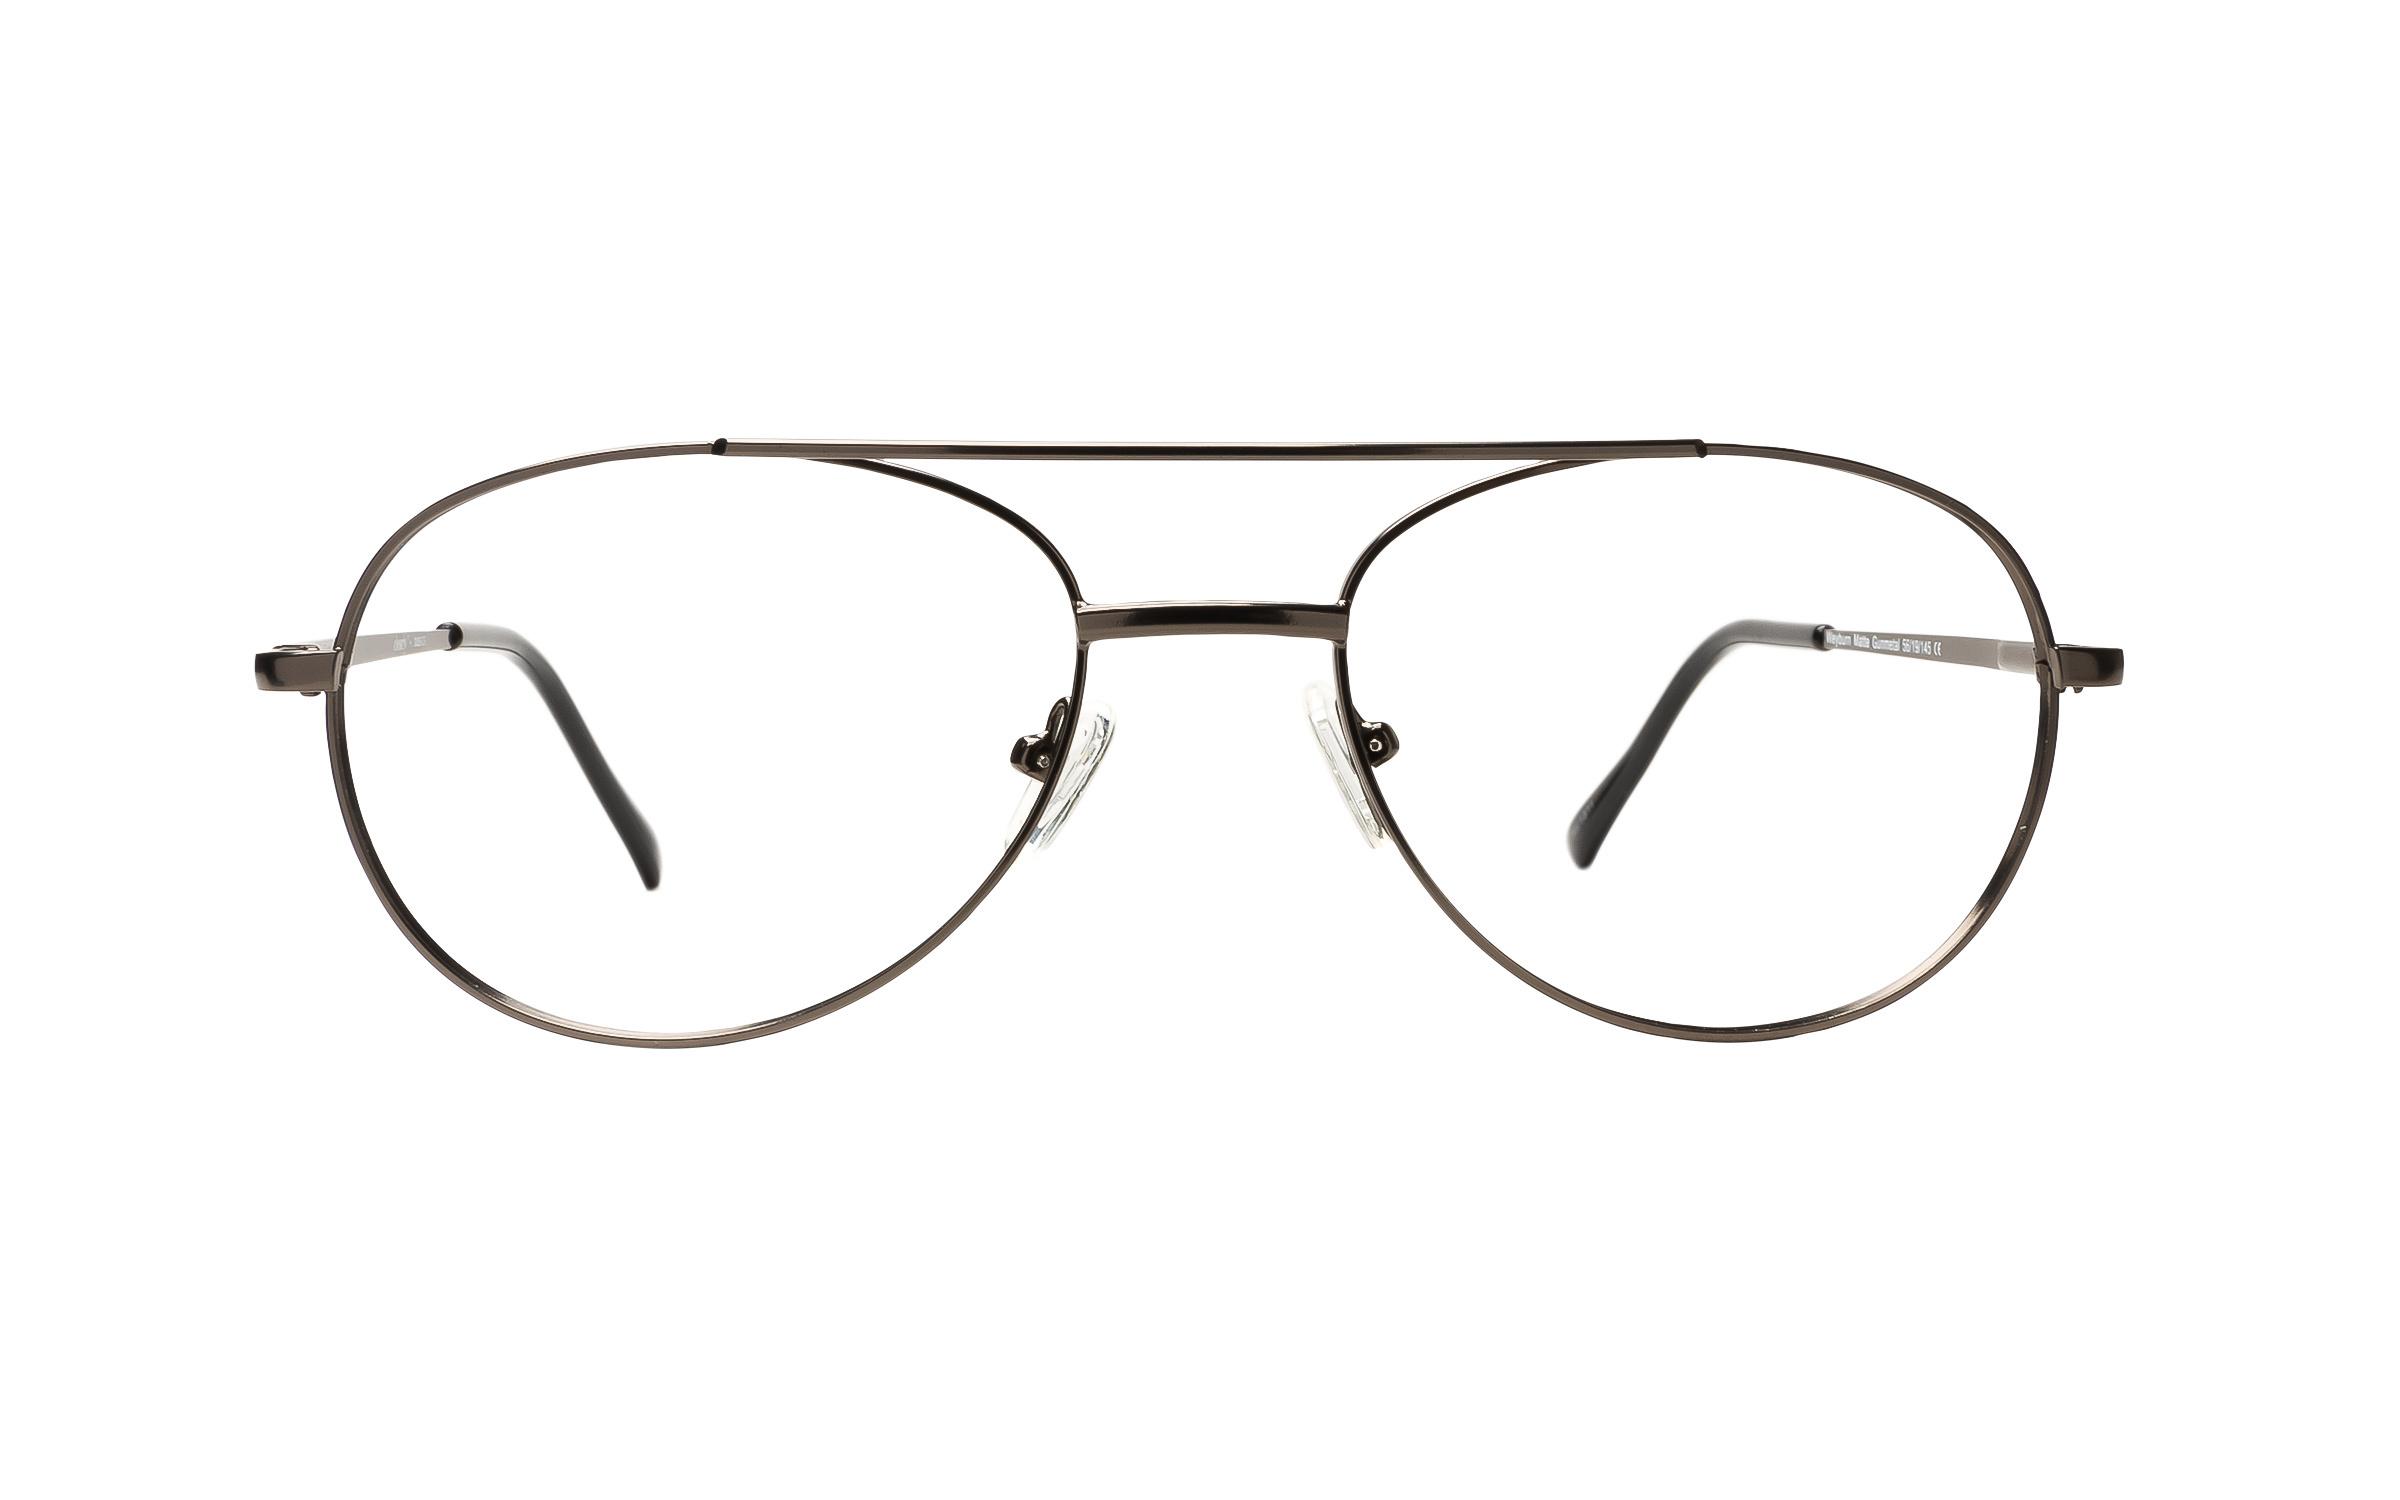 Clearly Basics Weyburn (56) Eyeglasses and Frame in Matte Gunmetal Grey | Plastic - Online